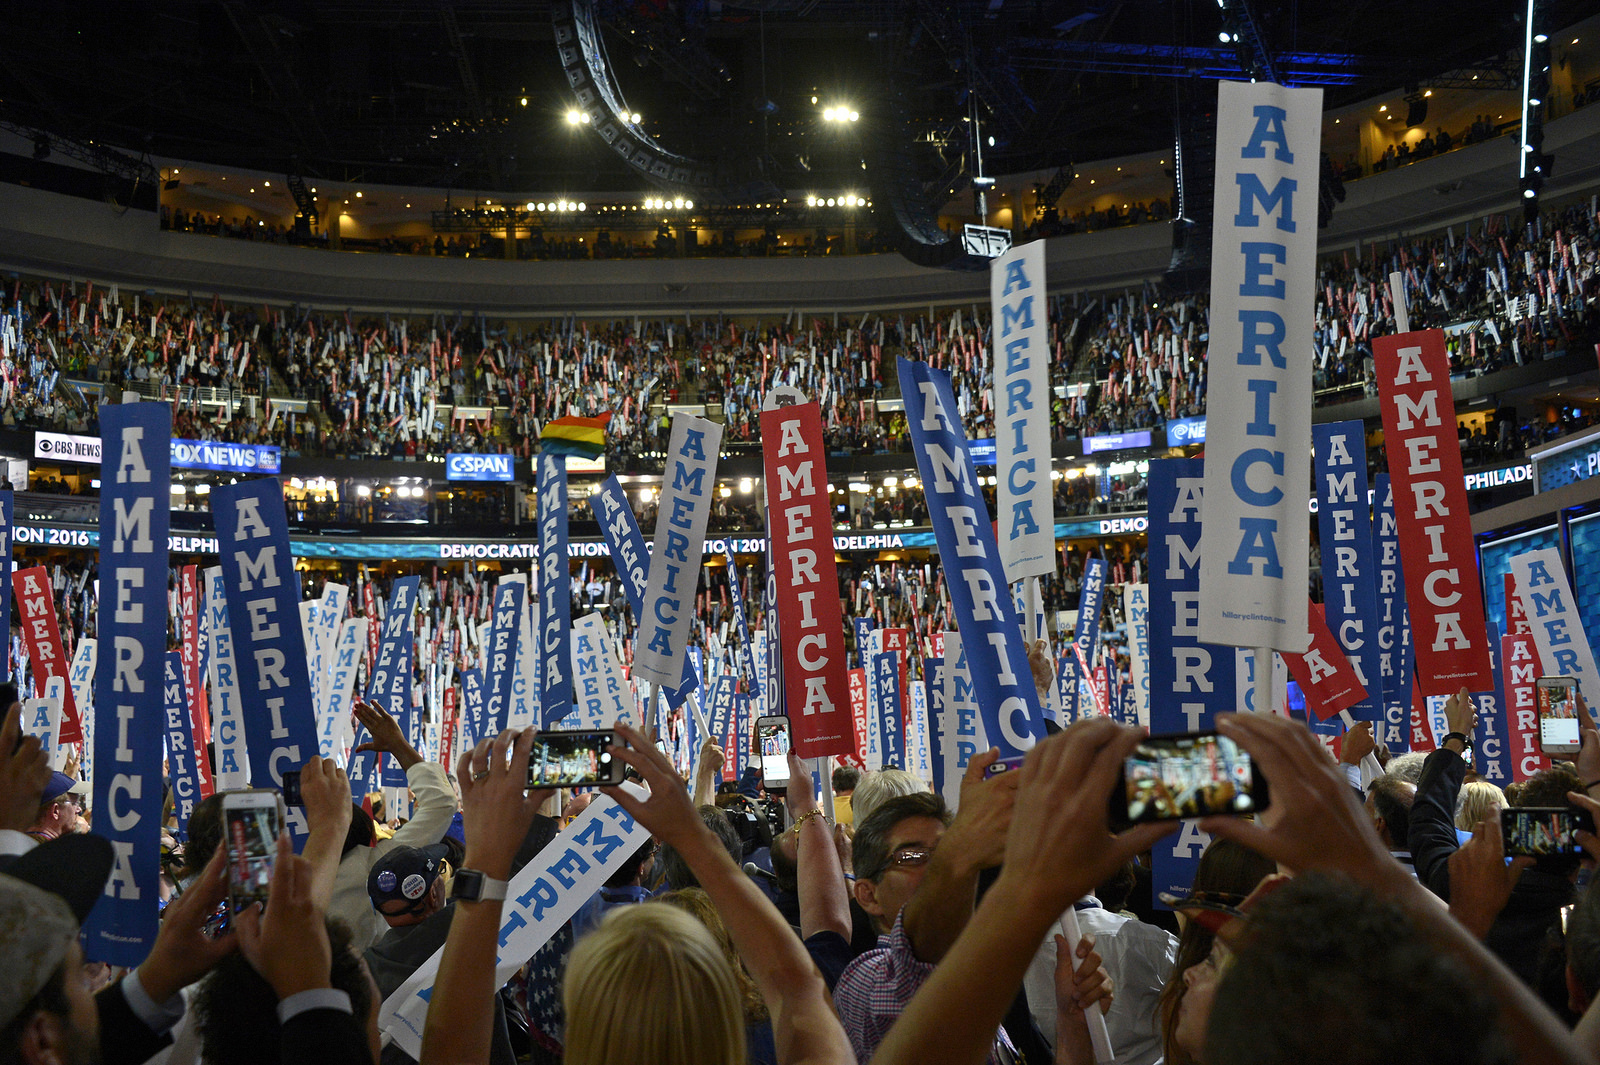 Democratic National Convention 2016, Photo: ABC/Ida Mae Astute